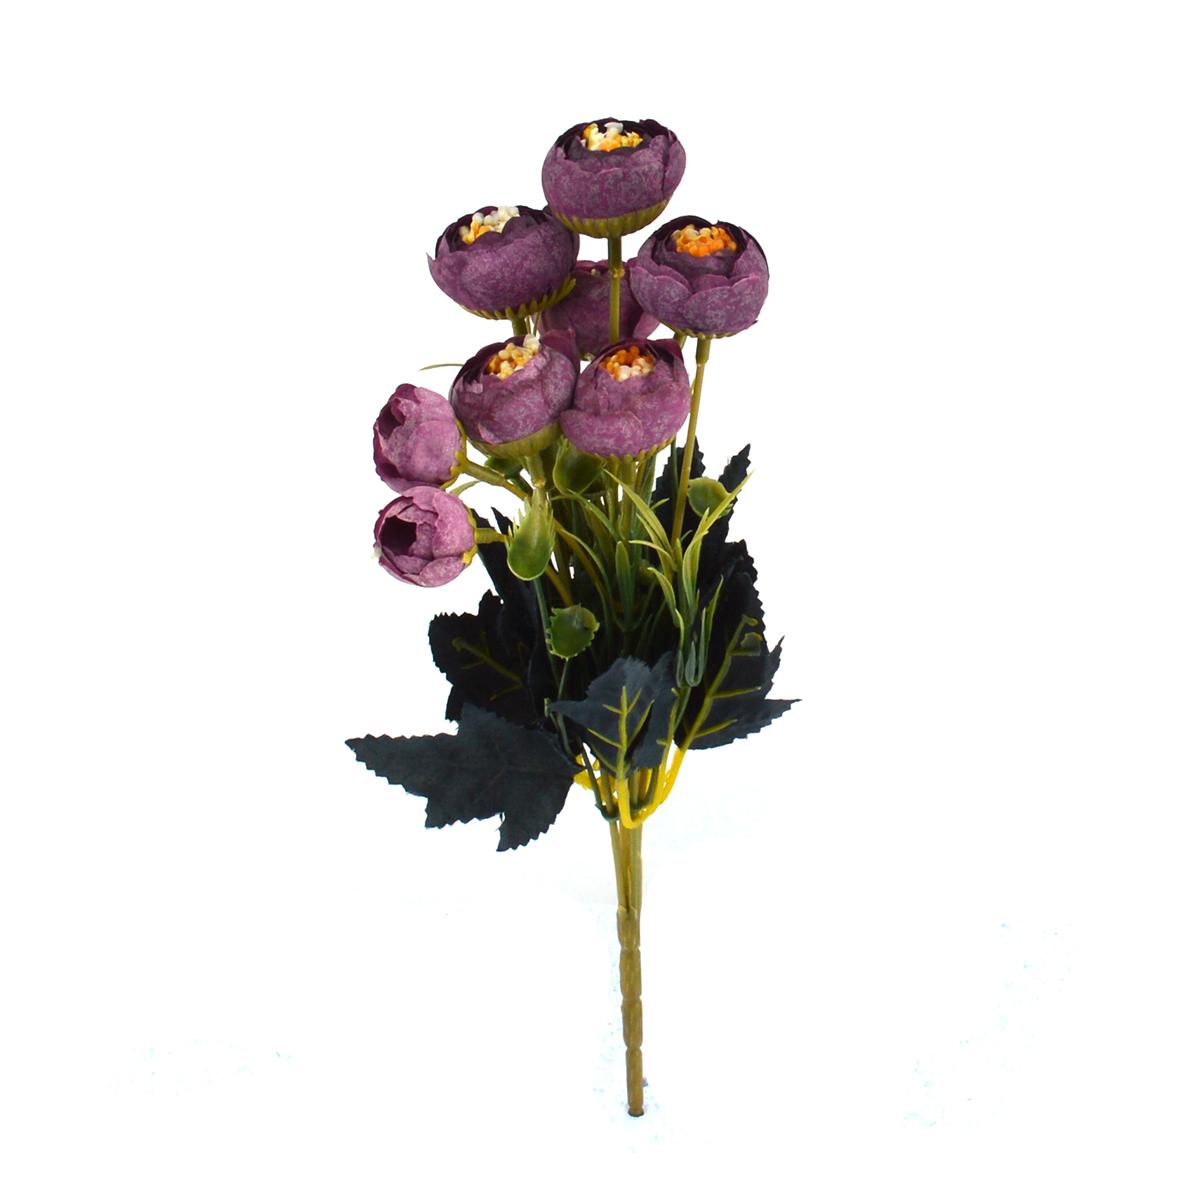 Ambalaje Flori ONLINE vinde Mini Buchet Ranunculus Vintage Marsalla la pretul de 7.9 lei